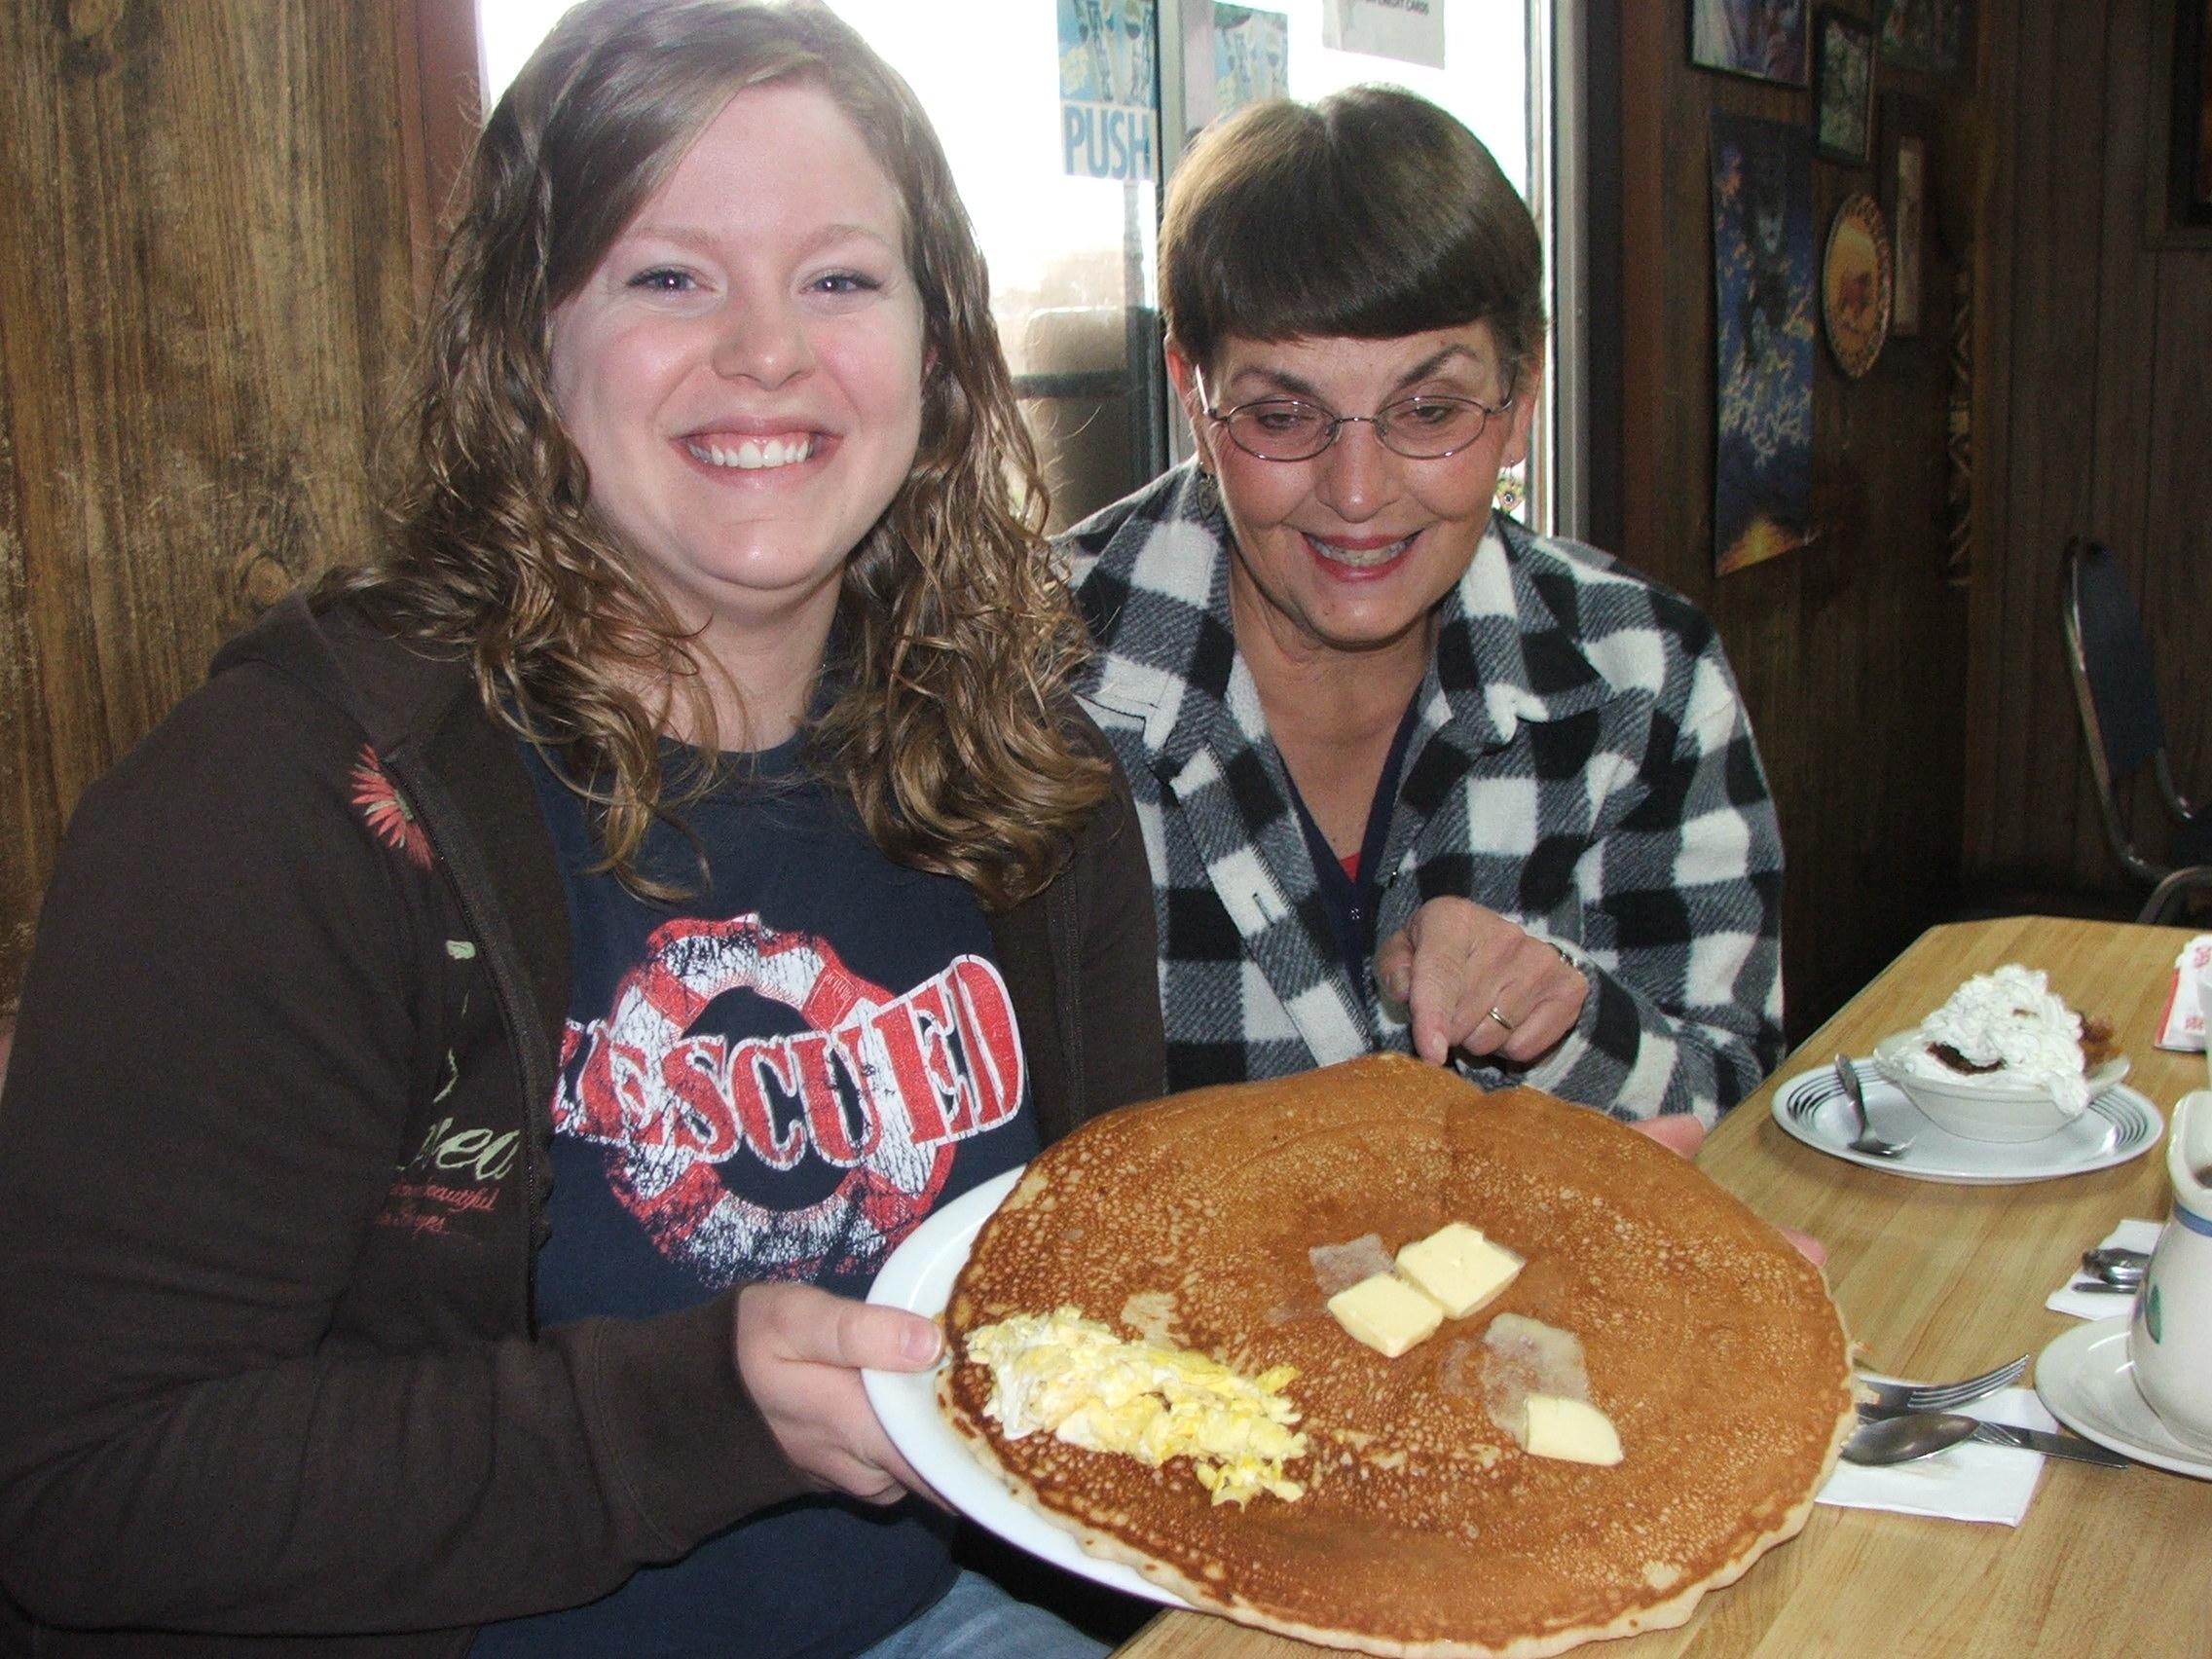 @ Shirley Mays Restaraunt - HUGE PANCAKE w/ tiny egg